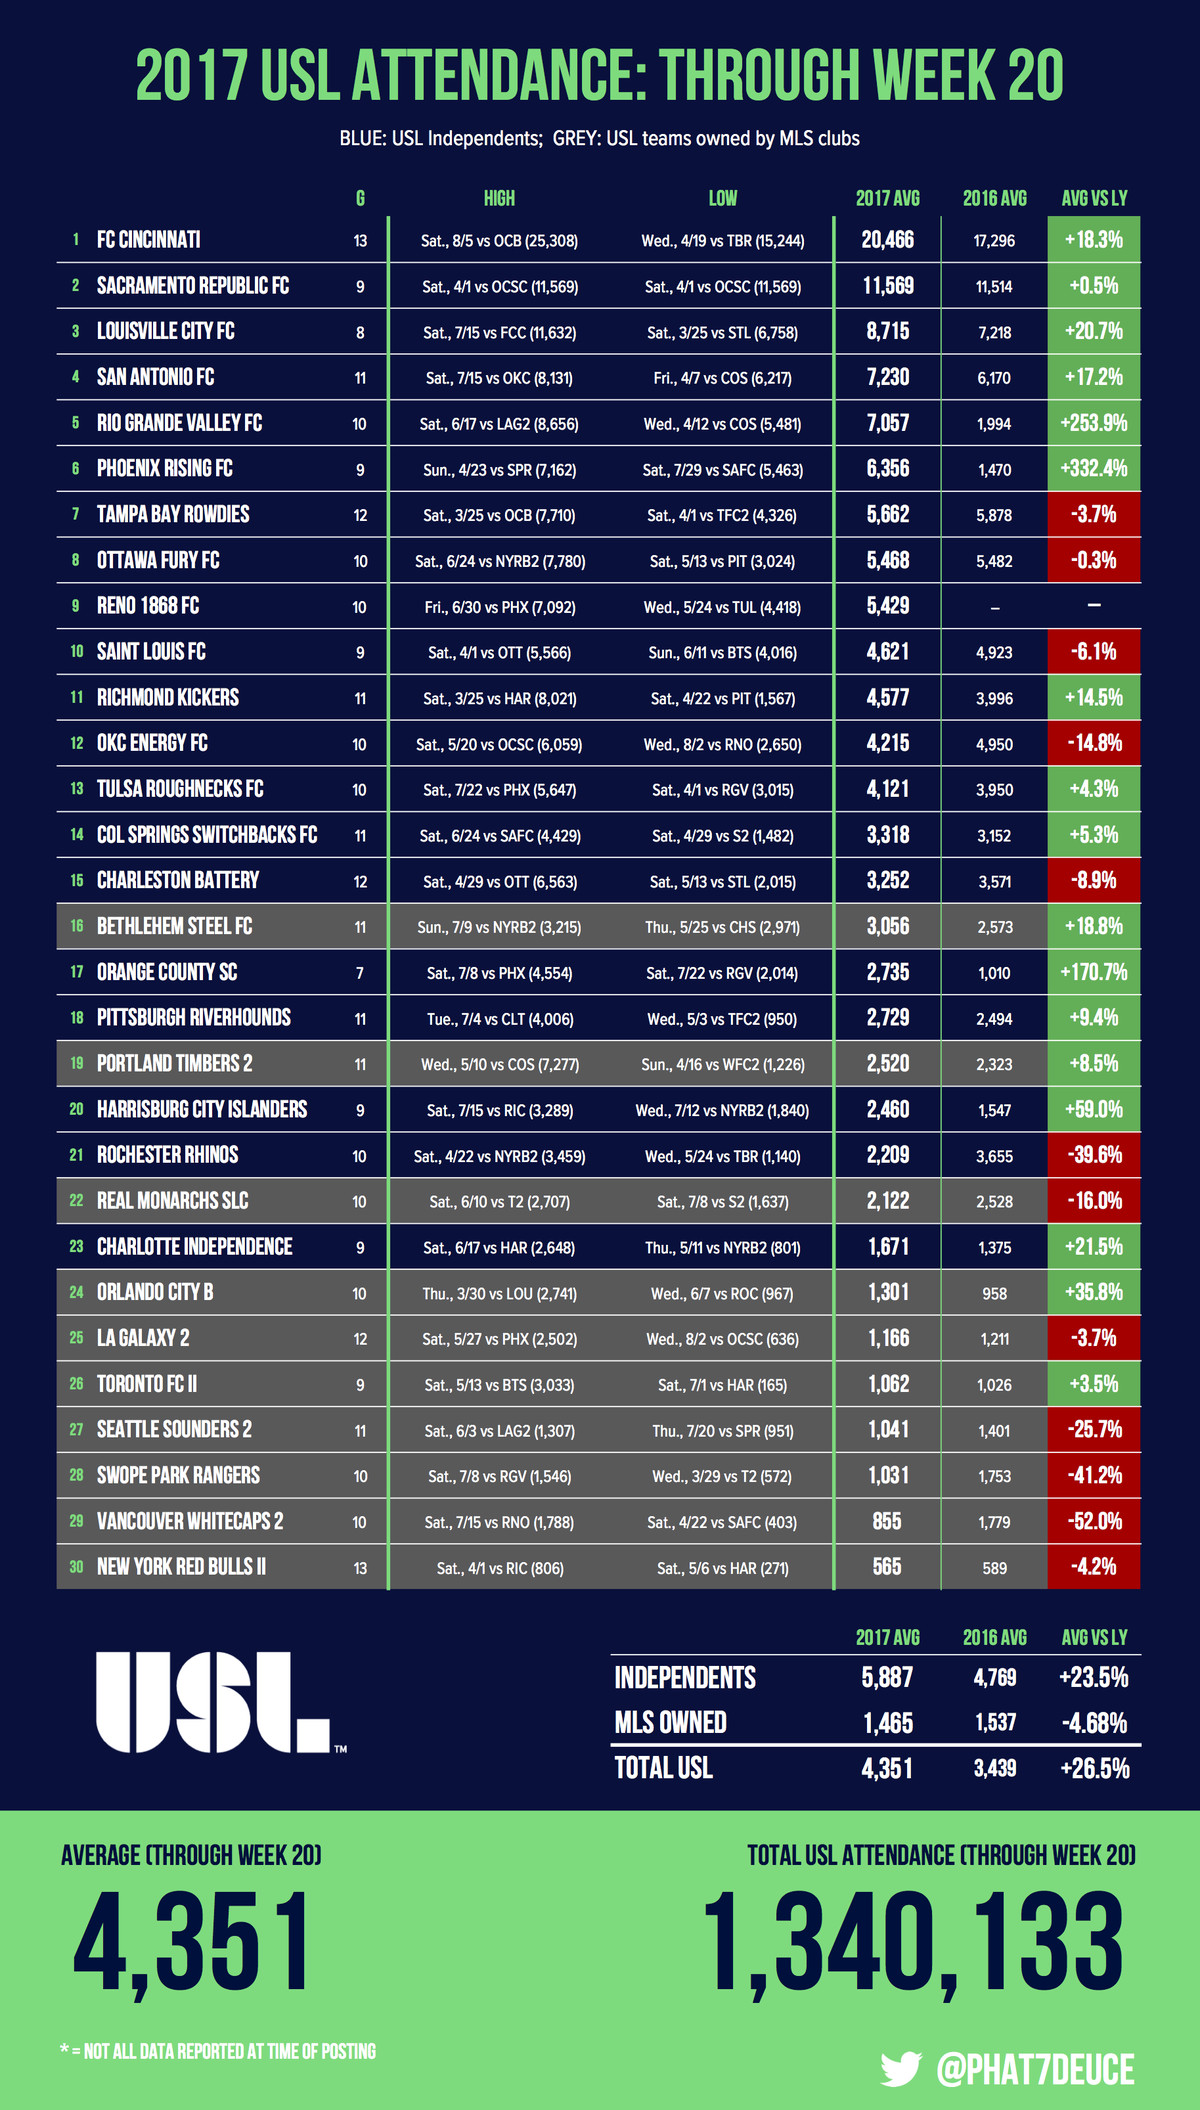 USL Attendance Through Week 20